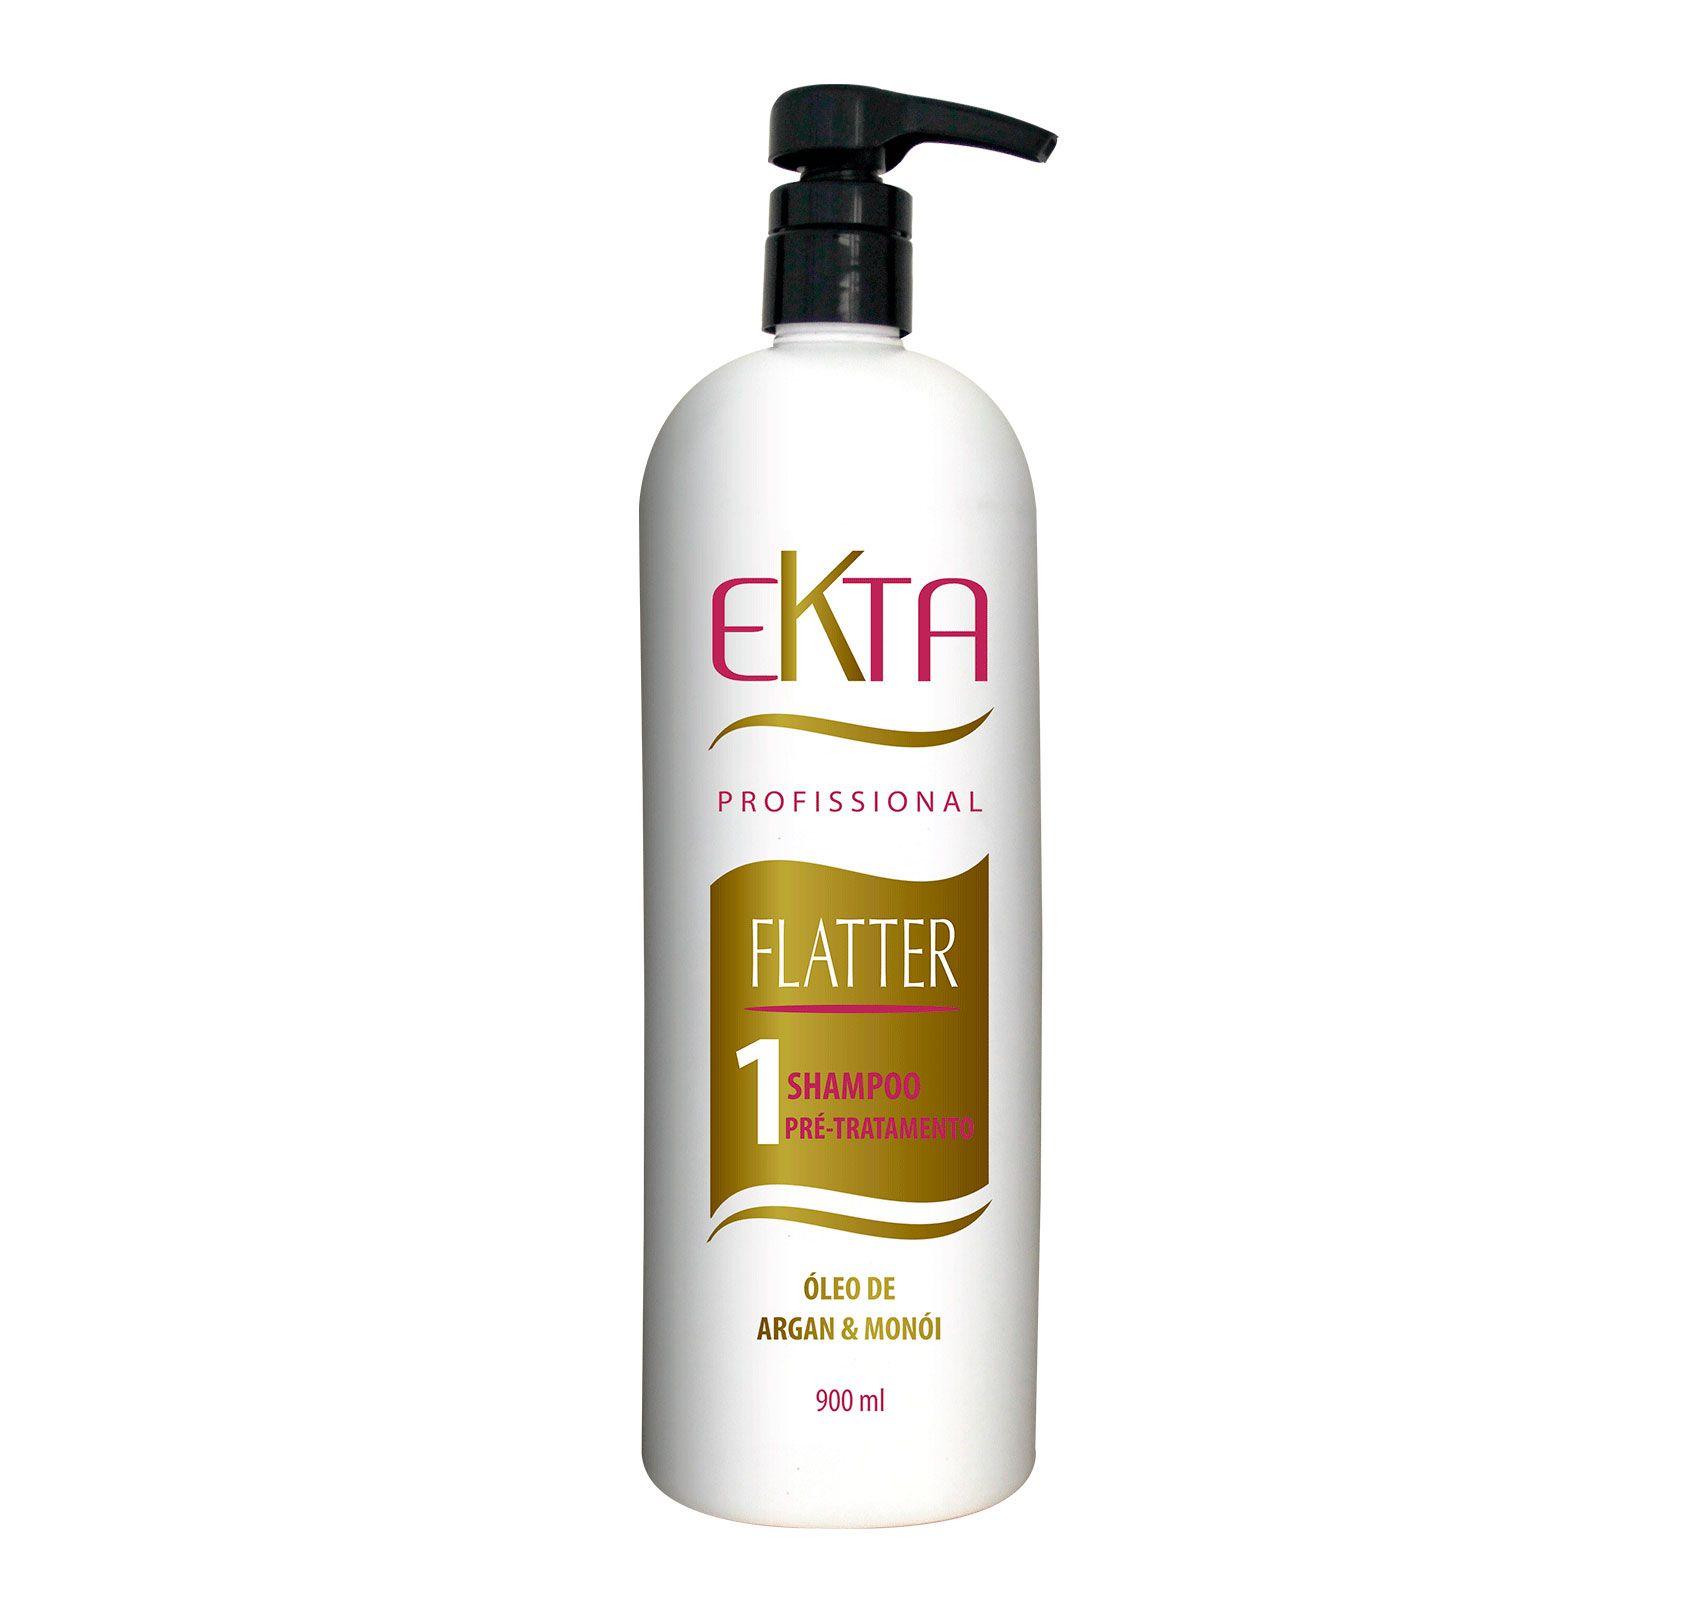 Flatter 1 - Shampoo